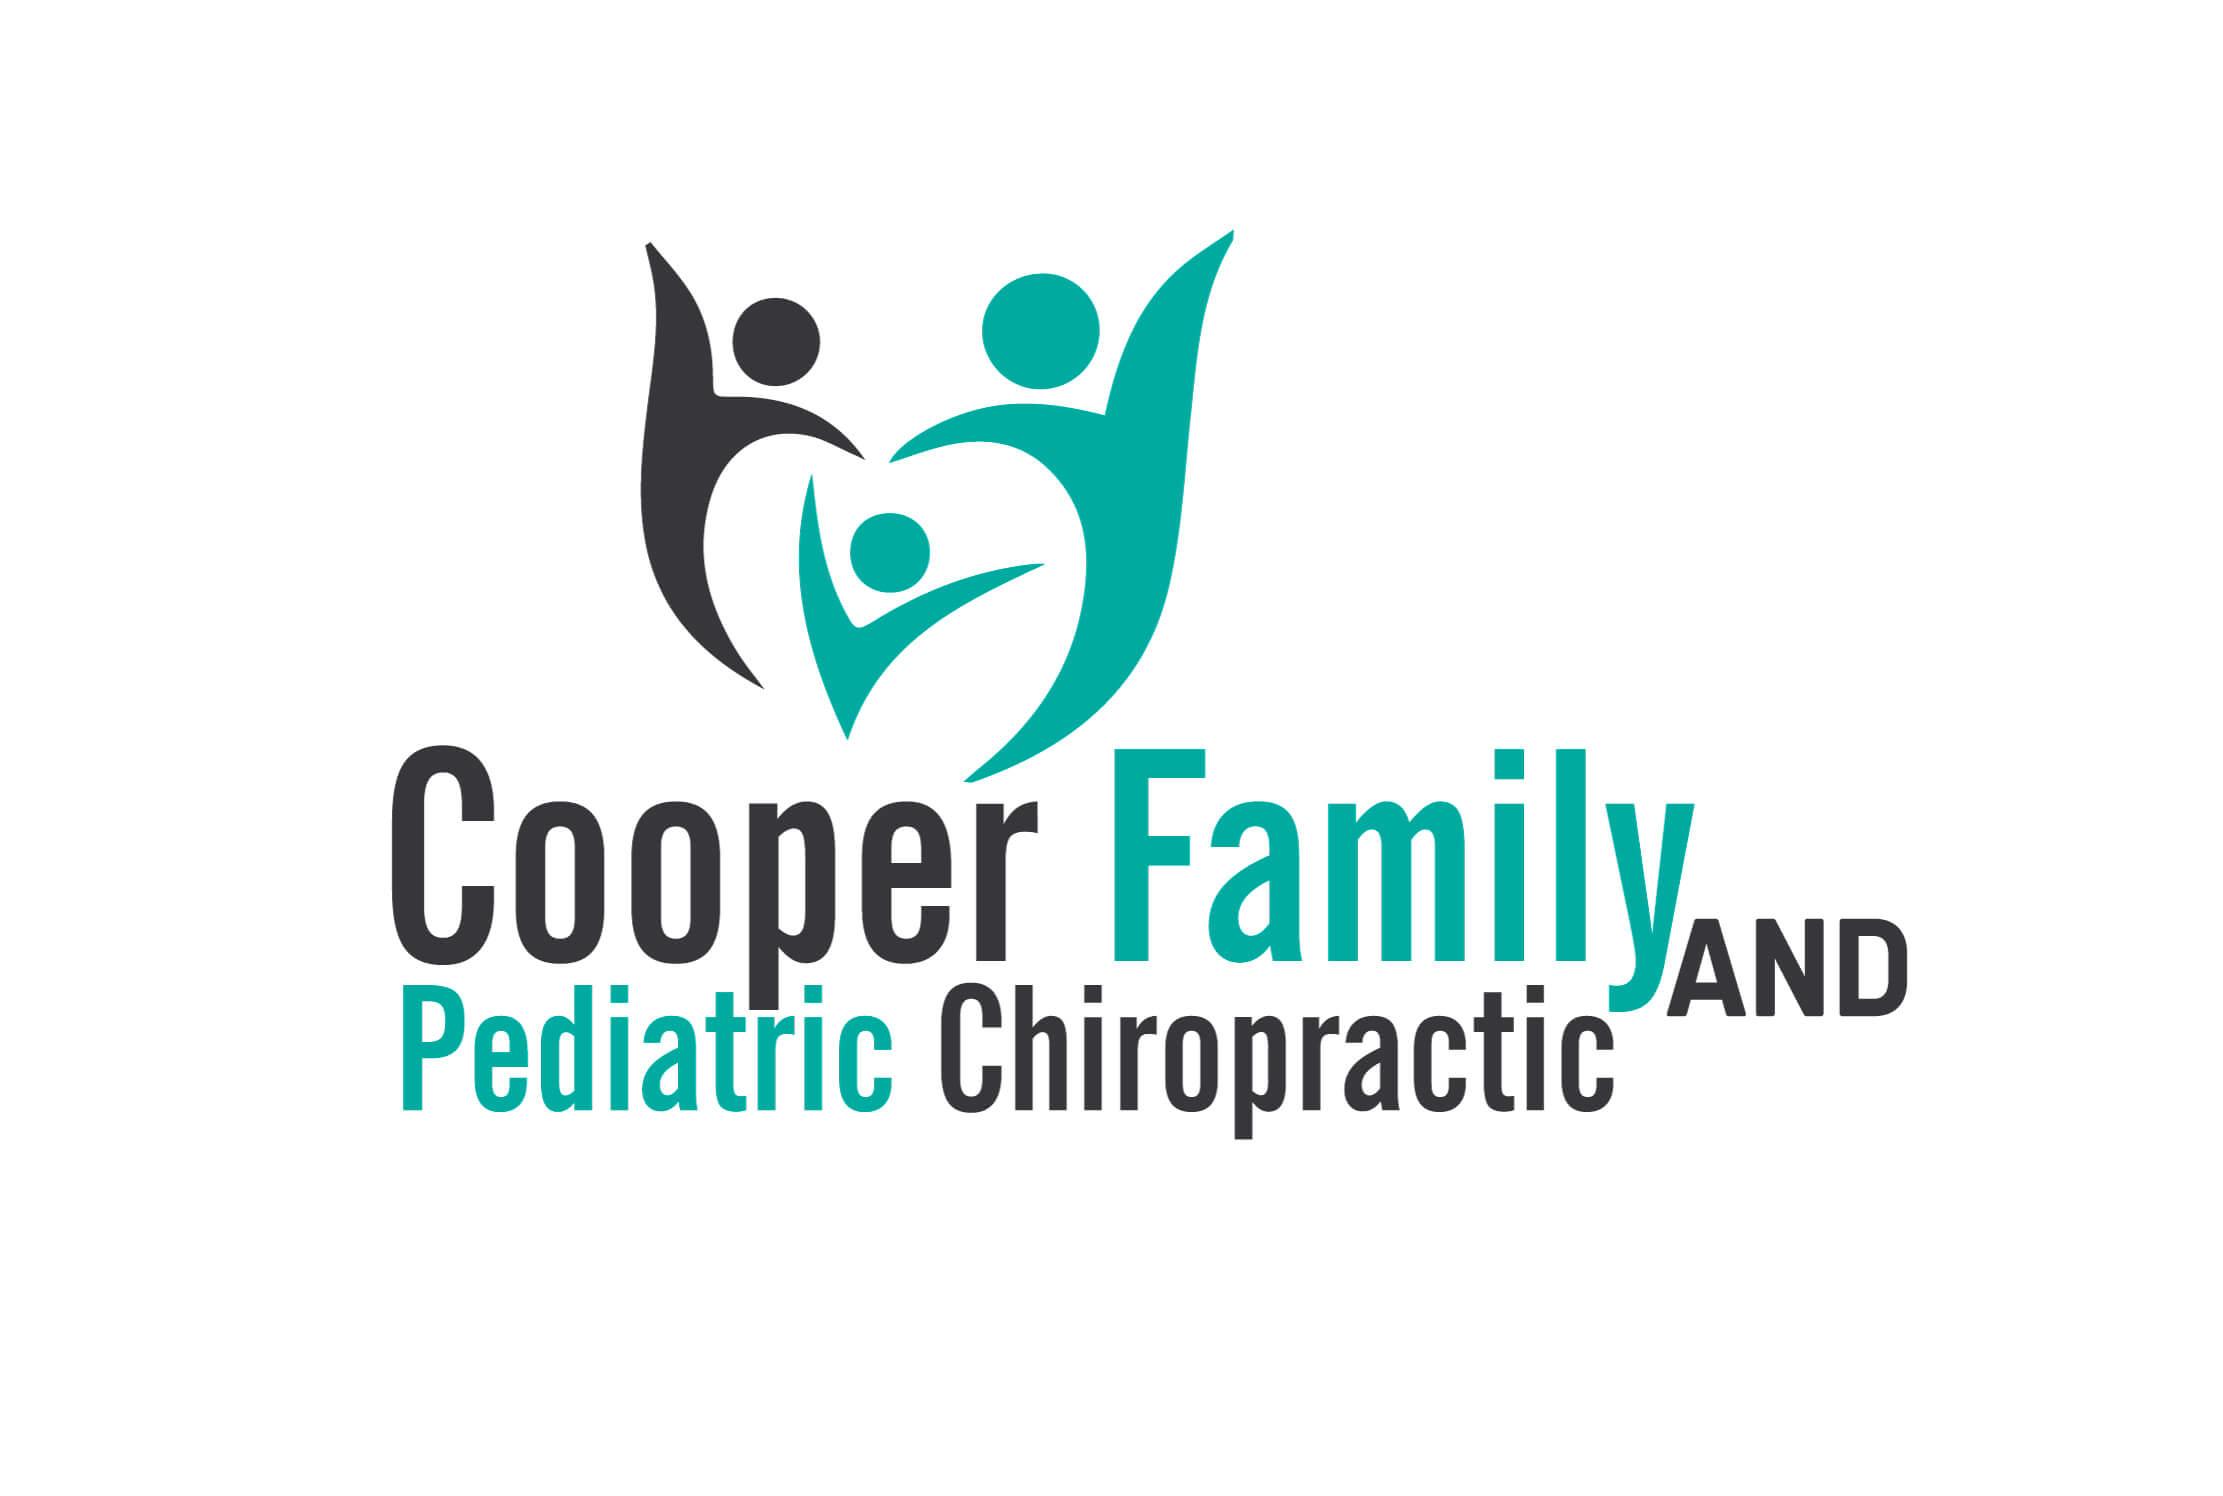 Cooper Family & Pediatric Chiropractic